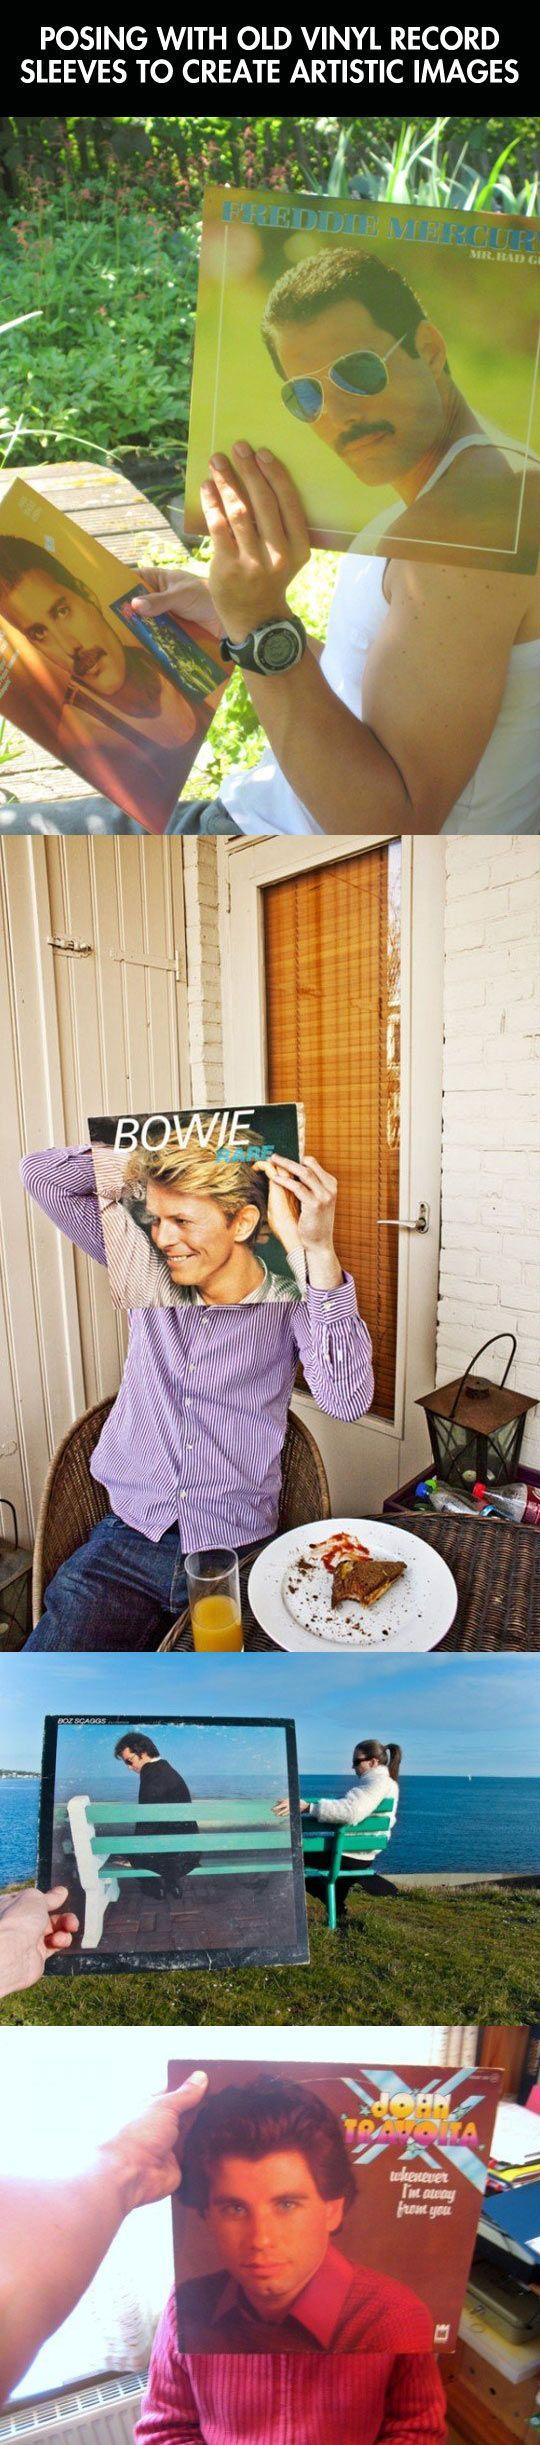 Posing with vinyl records…